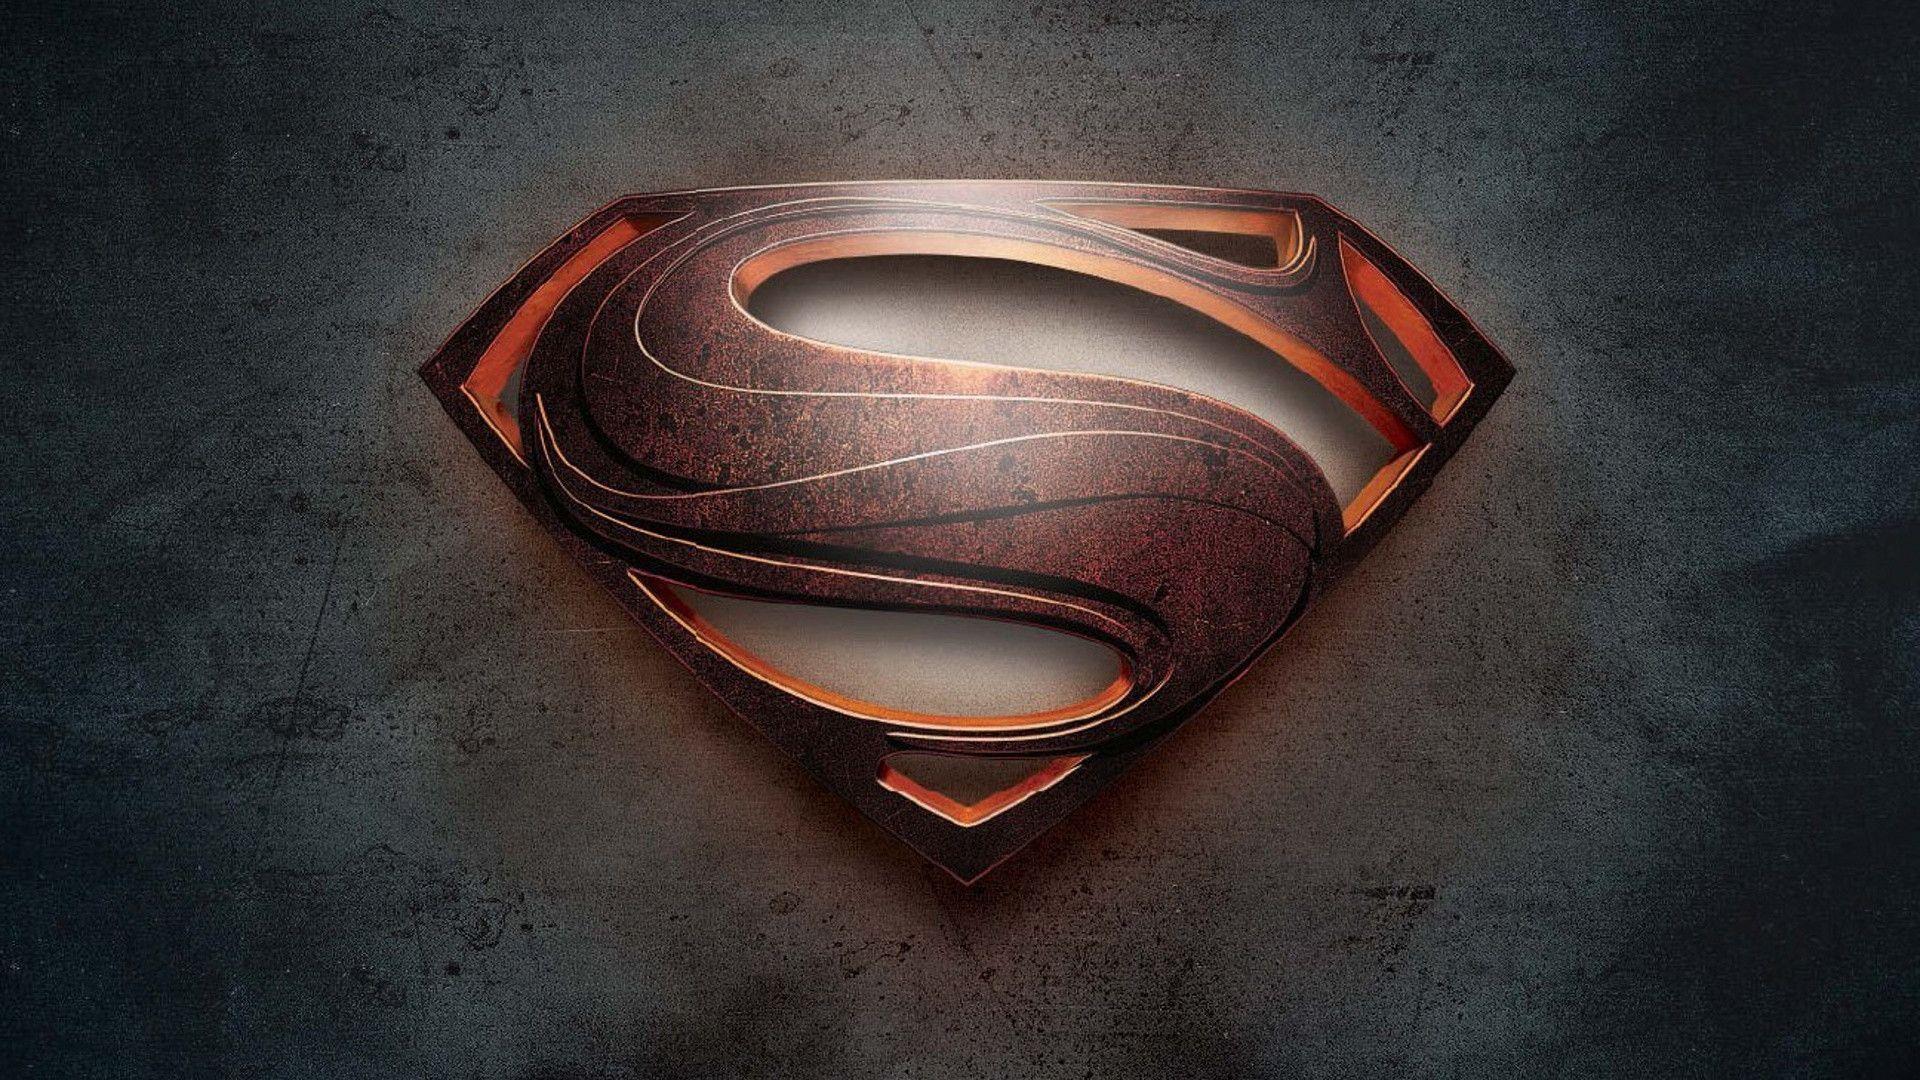 Superman logo wallpaper hd man of steel 1080p genovic